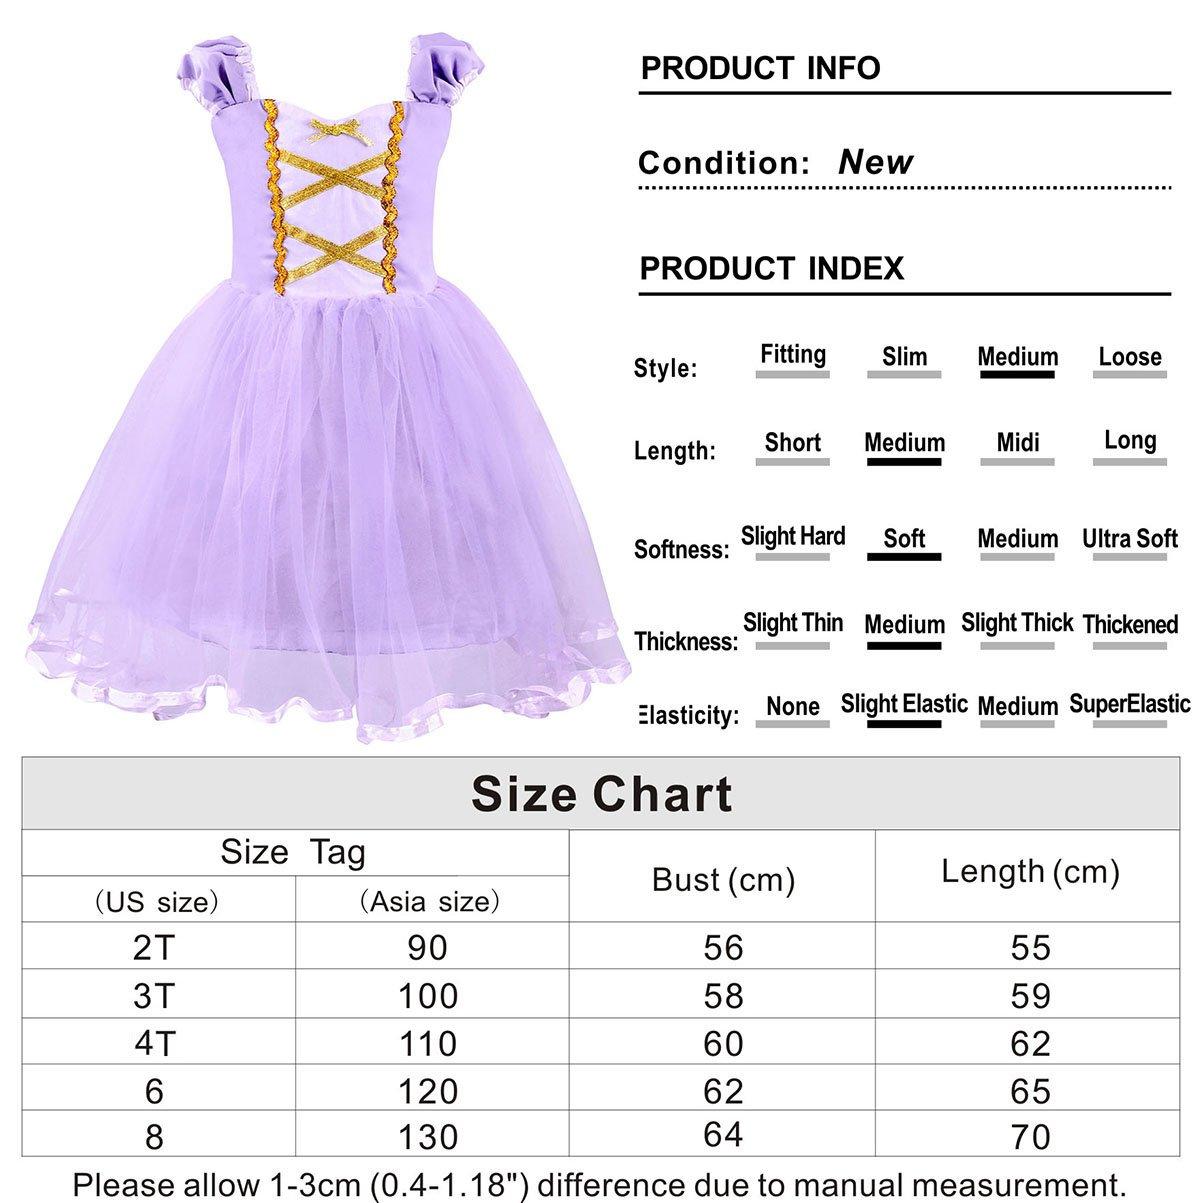 Cotrio Girls Princess Rapunzel Dress up Costume Halloween Cosplay Fancy Party Dresses Size 4T (110, Rapunzel Tutu Dress) by Cotrio (Image #4)